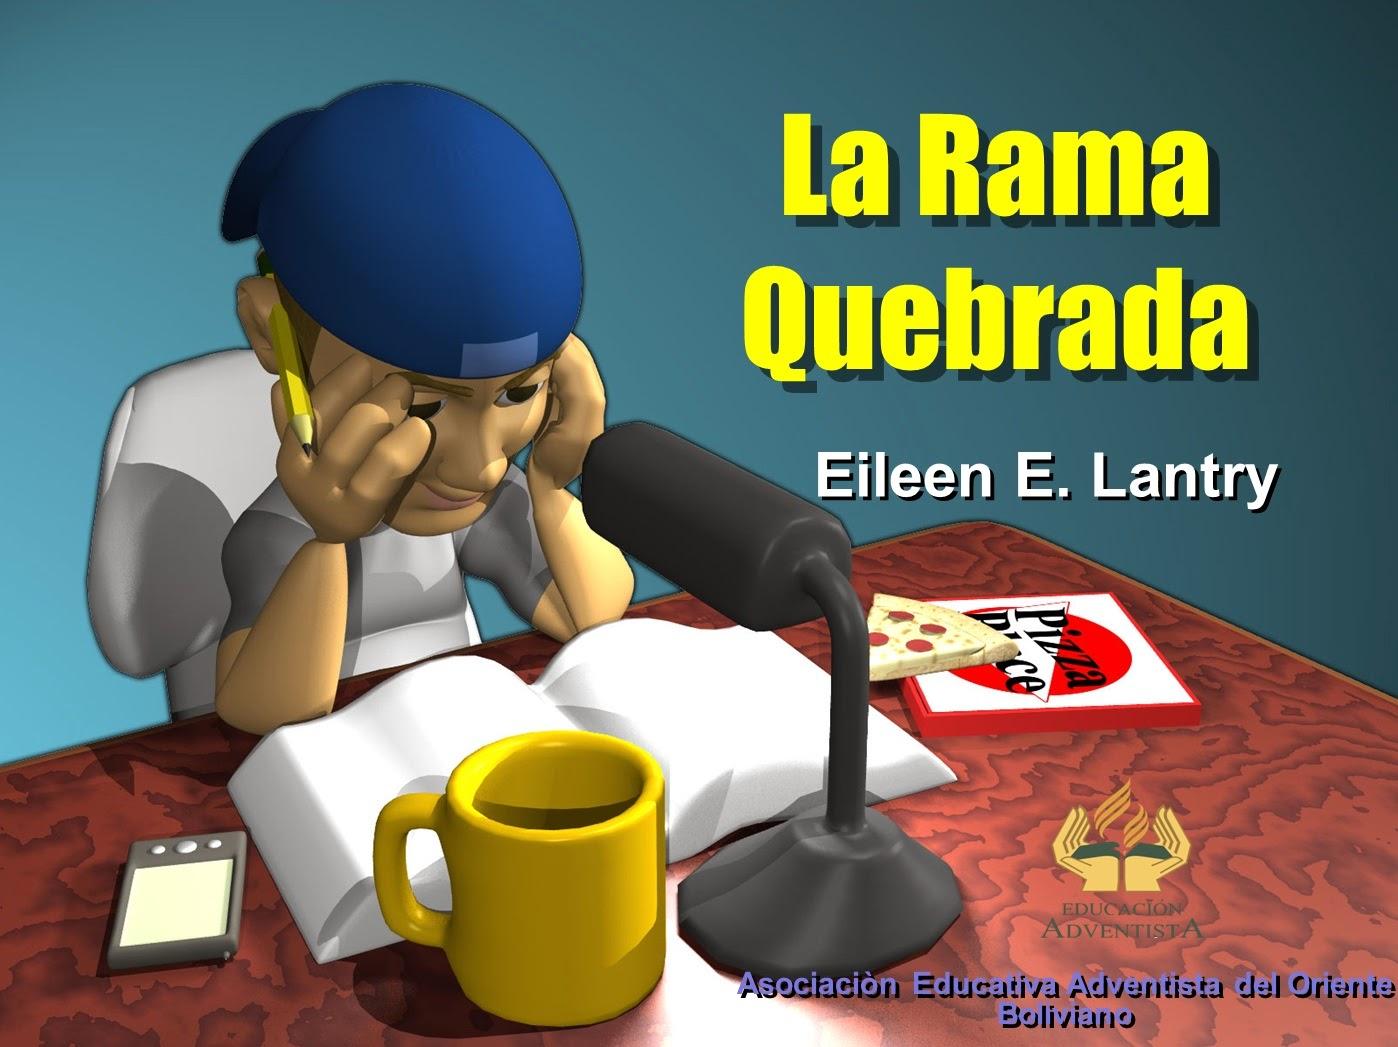 http://www.4shared.com/rar/X4RzPvUpba/PREGUNTA_LA_RAMA_QUEBRADA.html